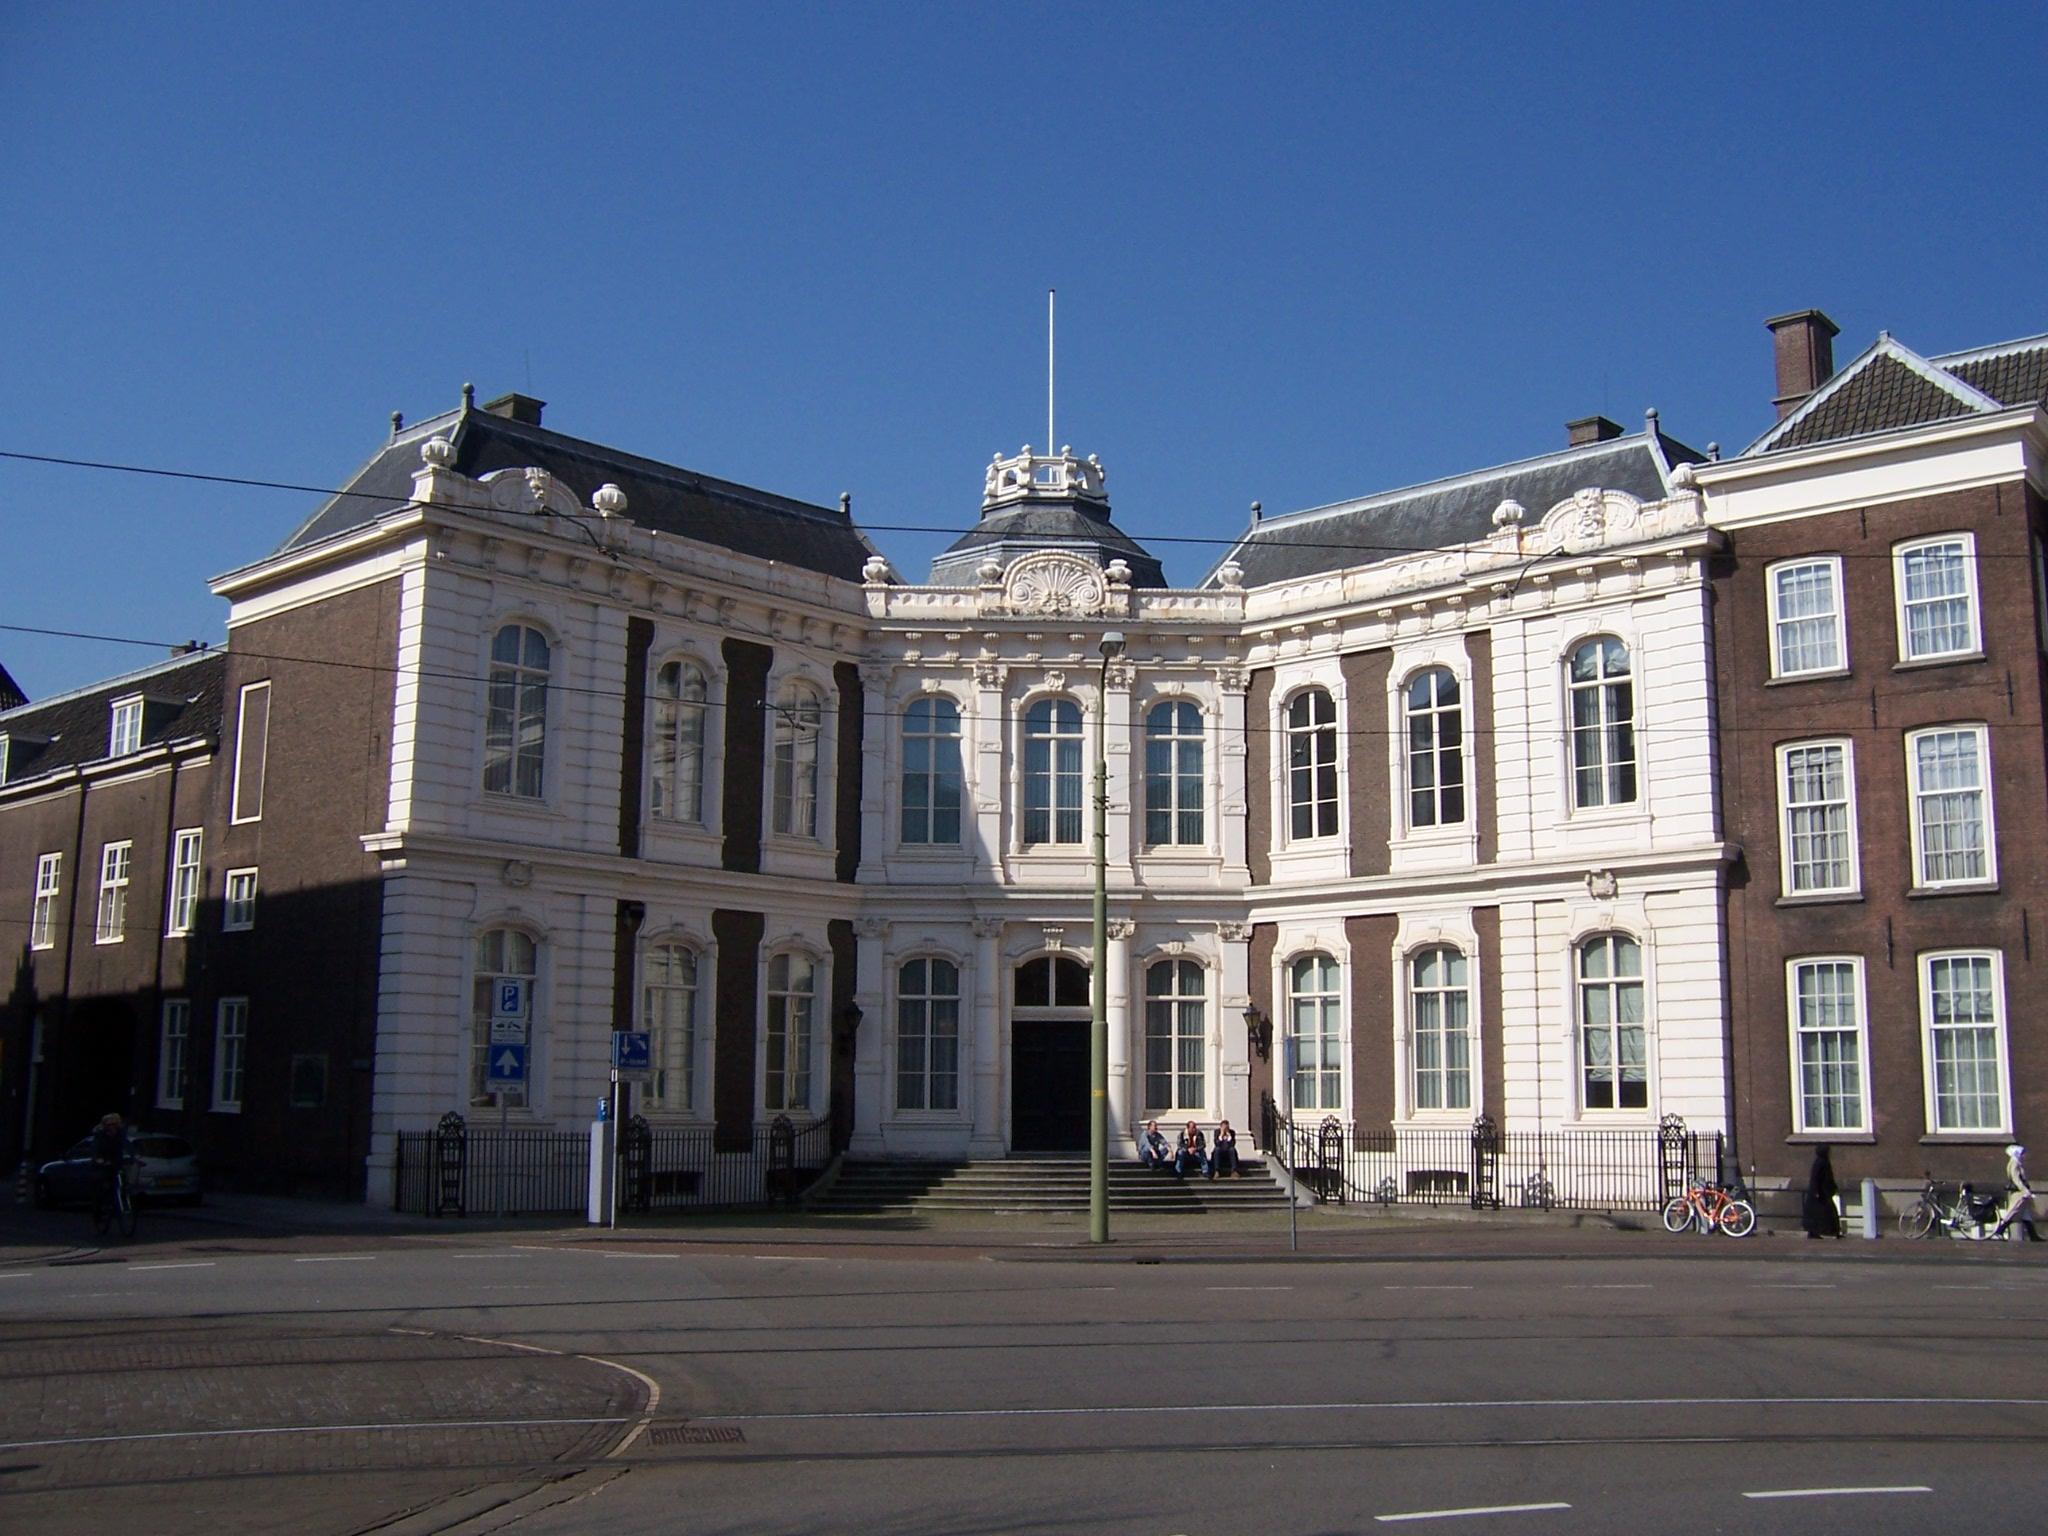 File:Den Haag Raad van State.jpg - Wikimedia Commons